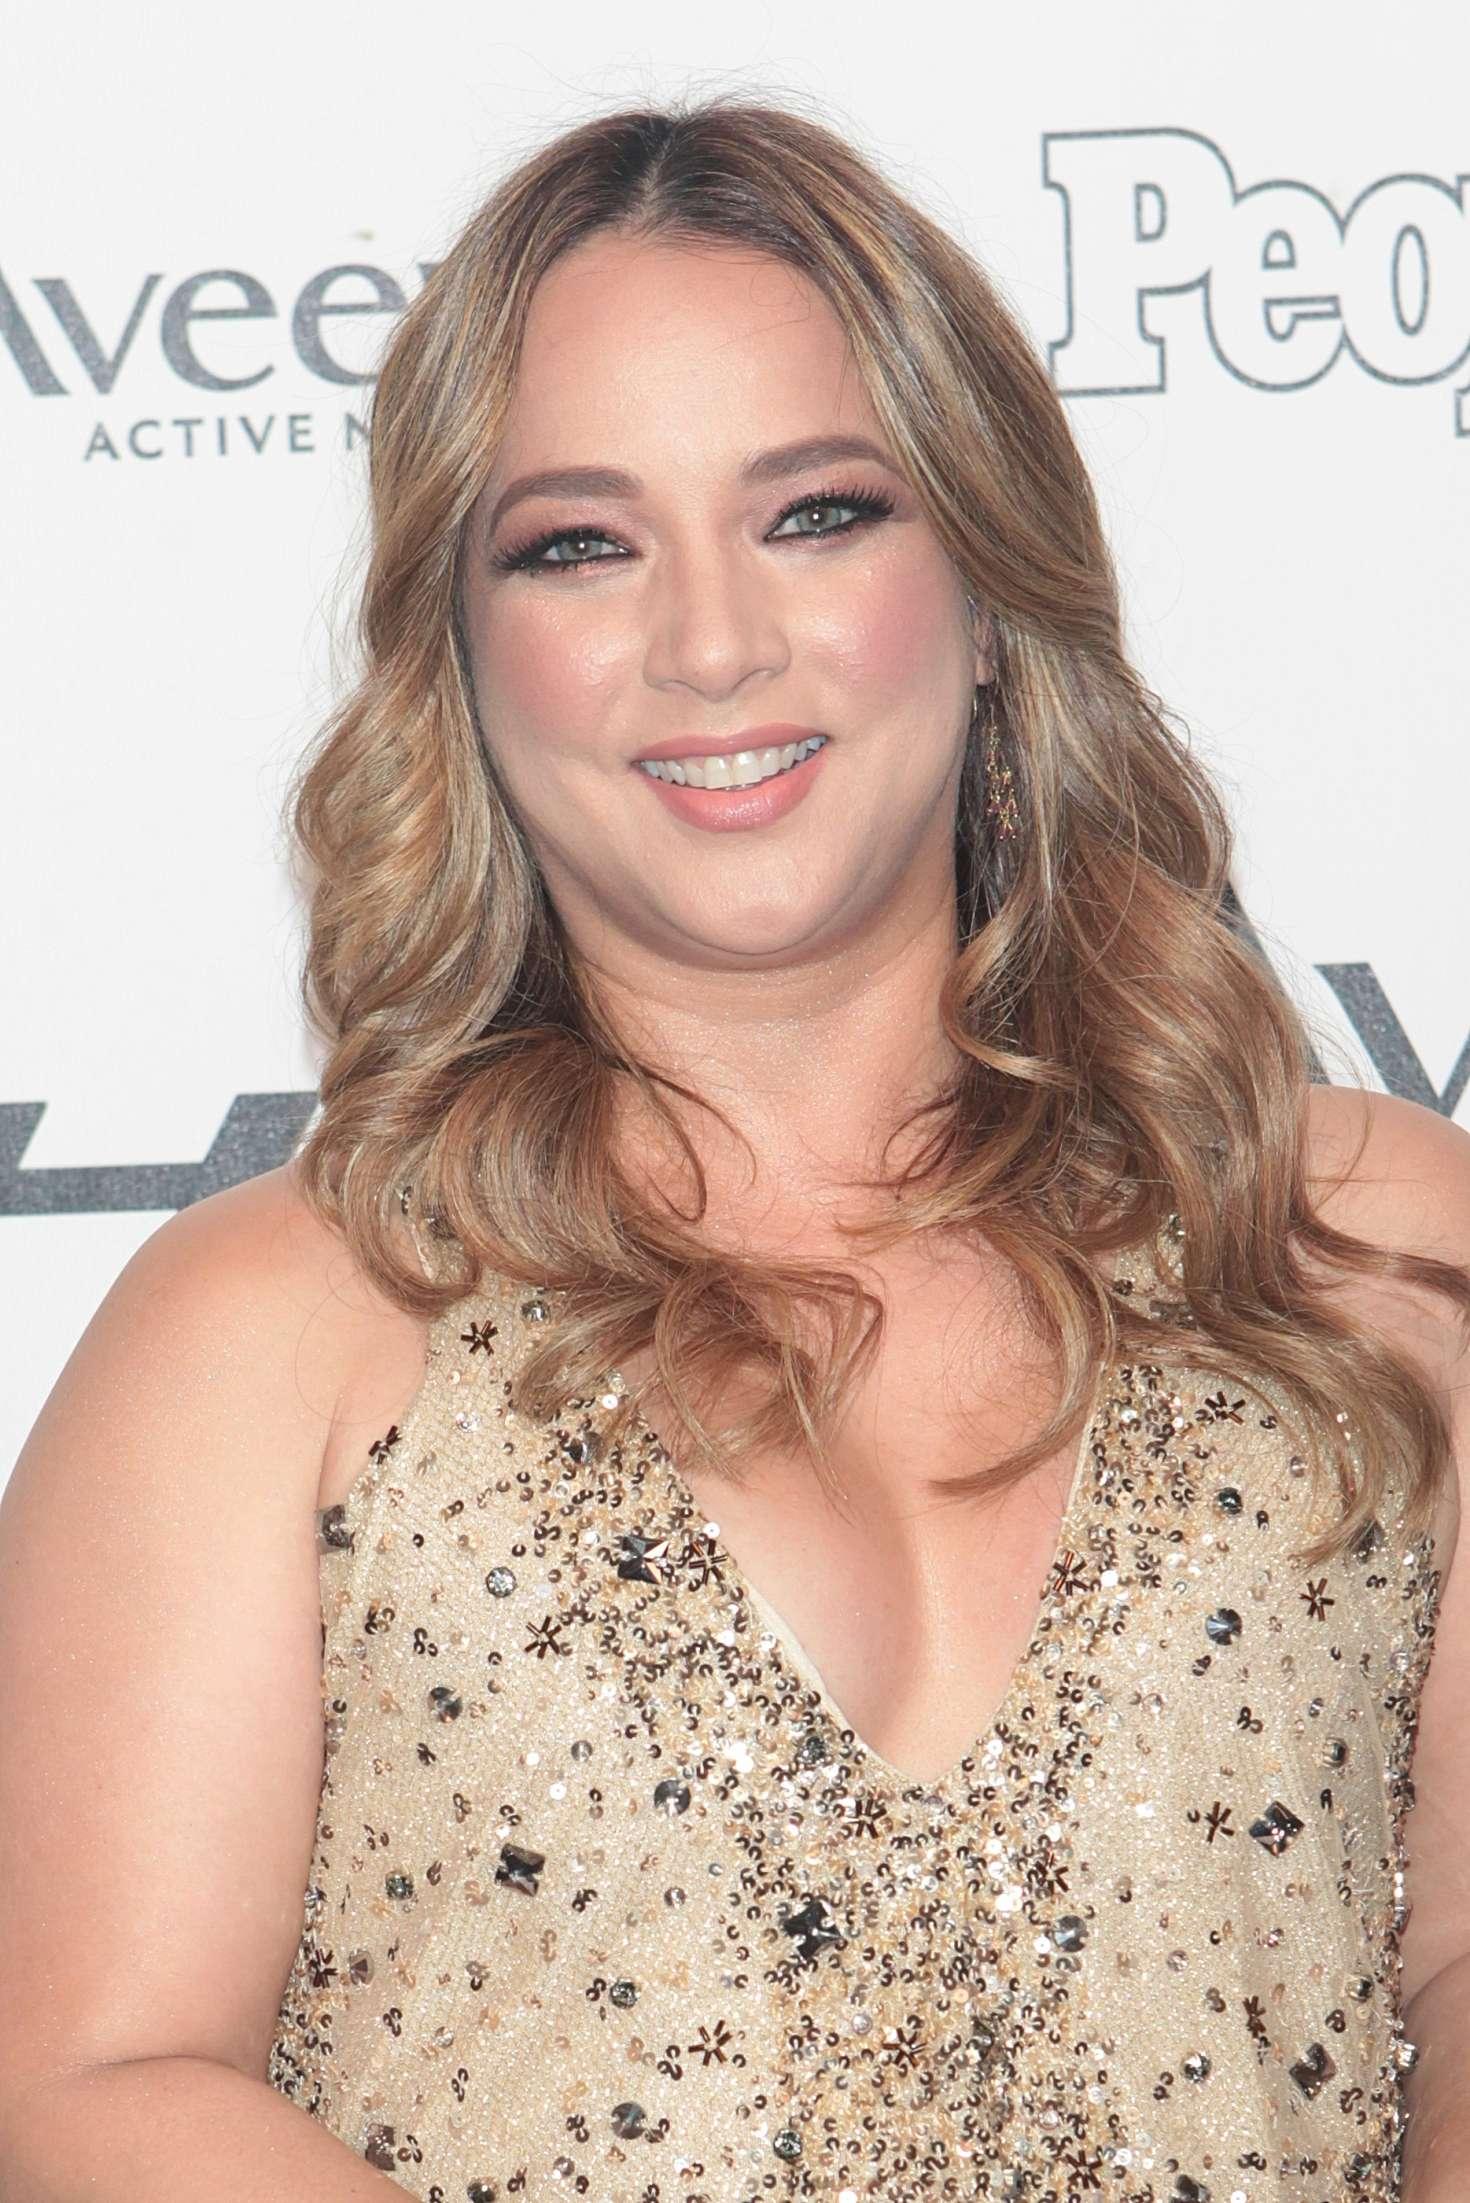 Adamari Lopez 2017 : Adamari Lopez: 2017 People en Espanols 50 Most Beautiful Gala – New York-01